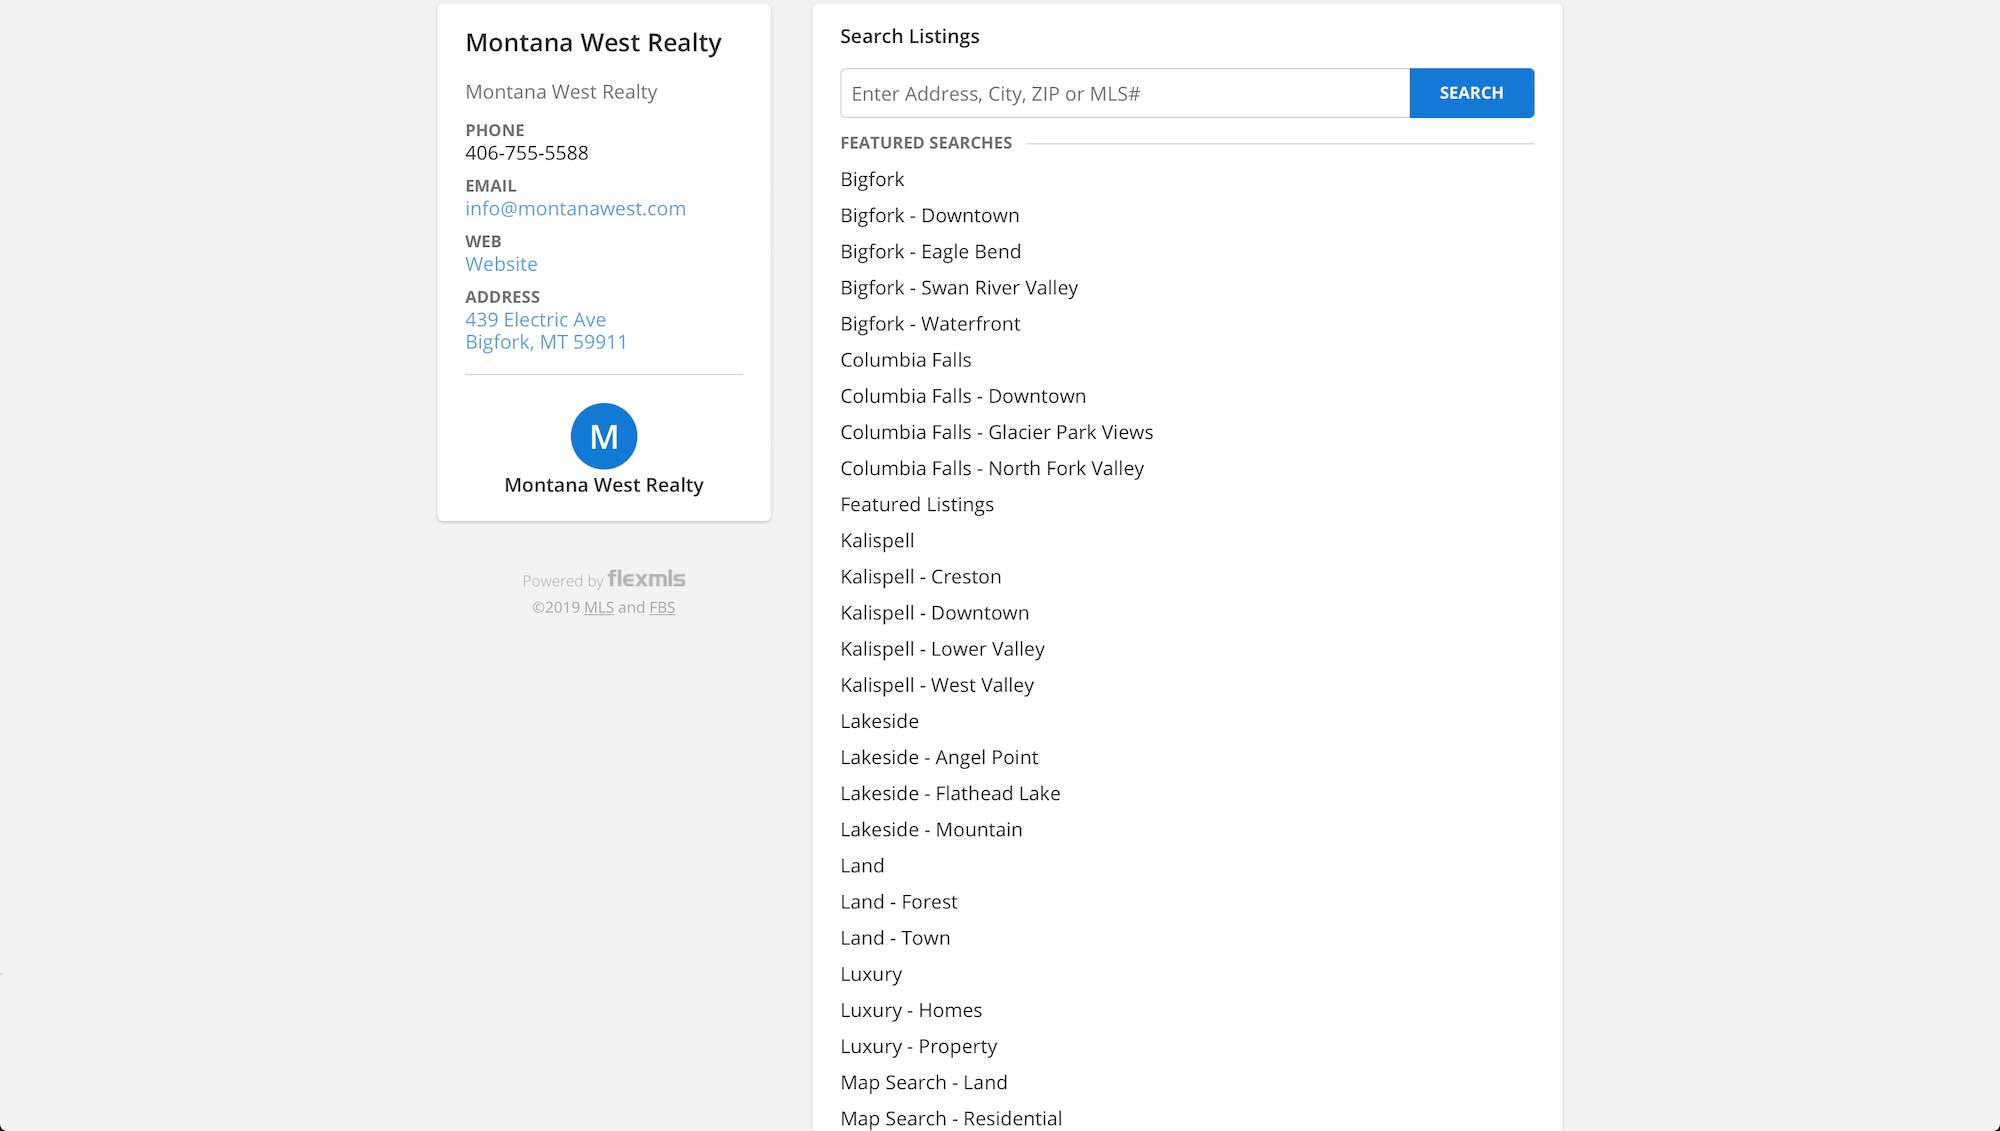 Portal_SavedSearches